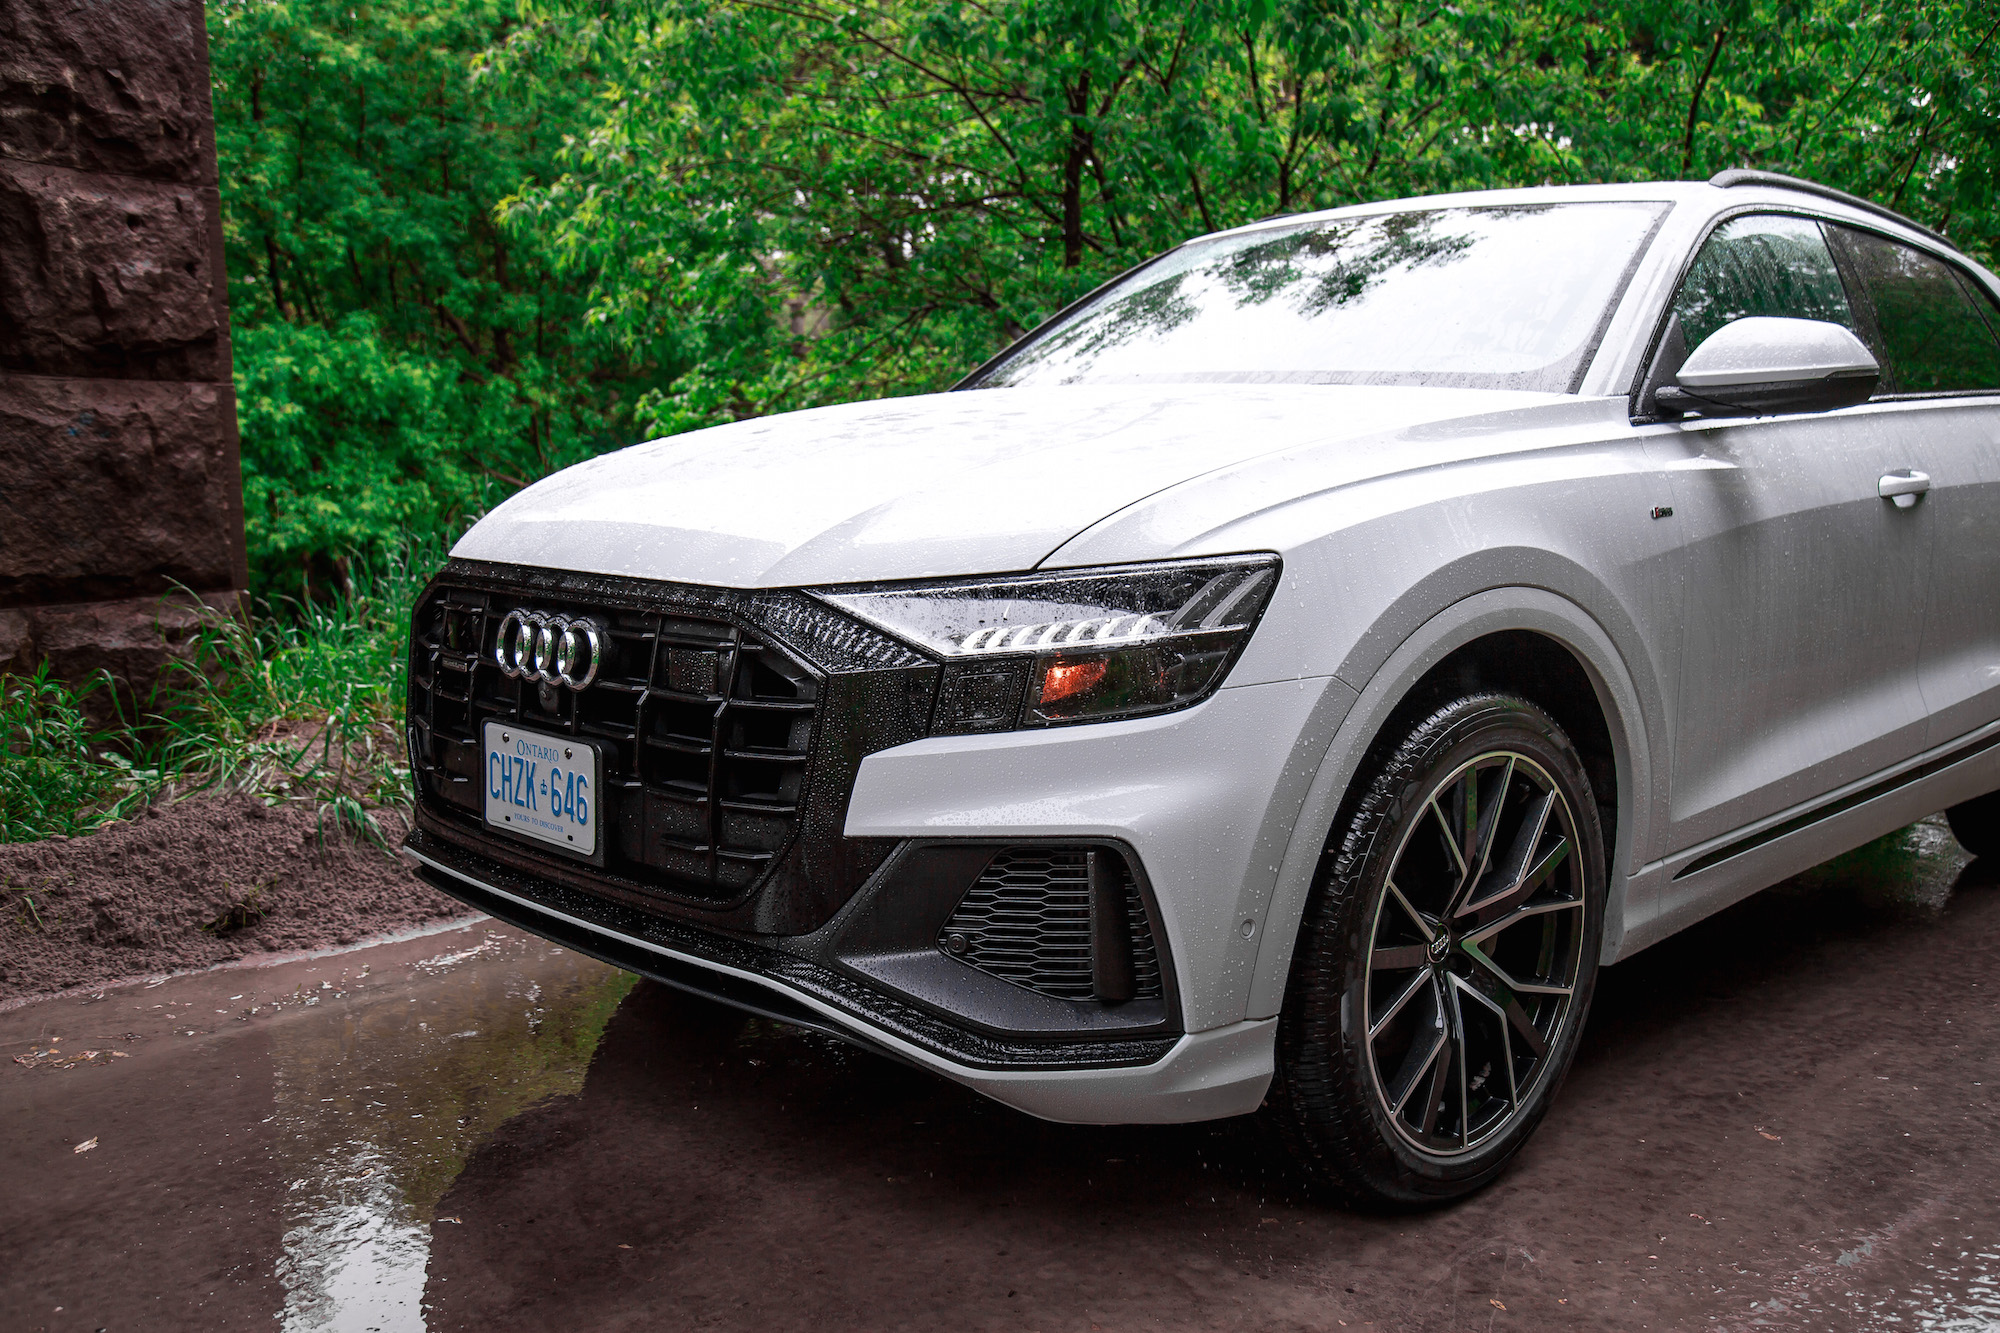 Review: 2019 Audi Q8